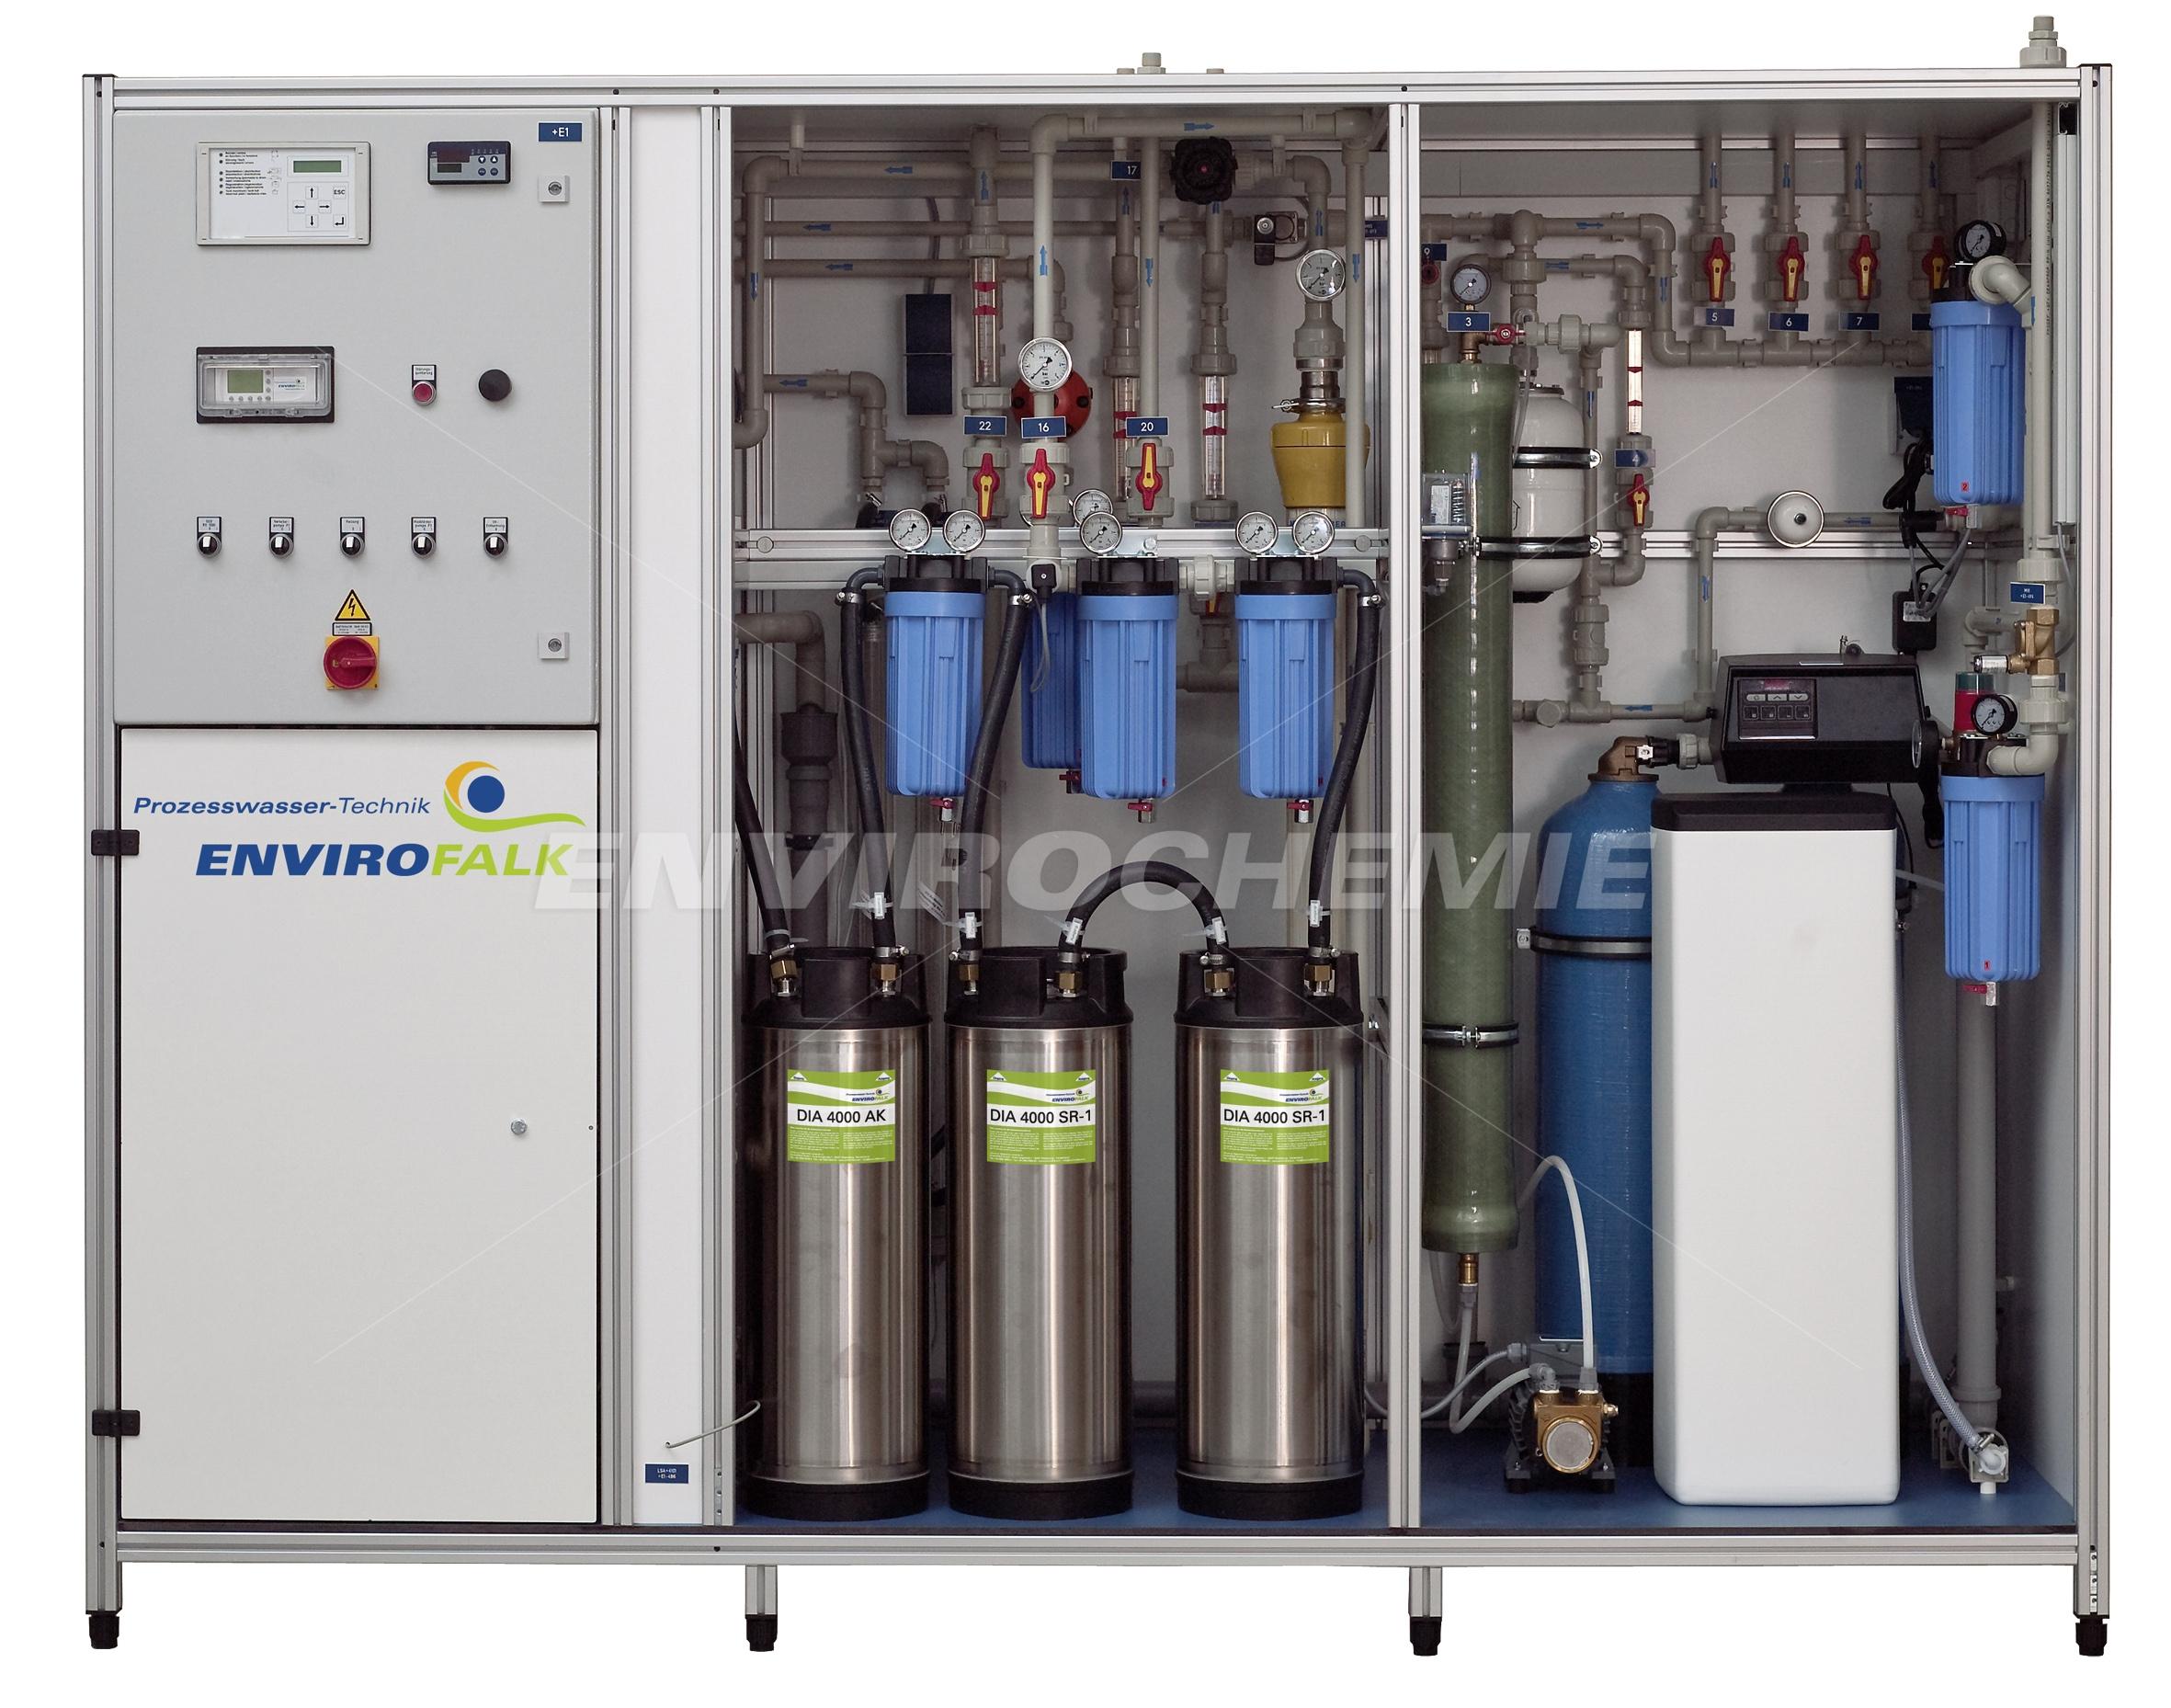 EnviroFALK kompakte Wasseraufbereitungsanlage